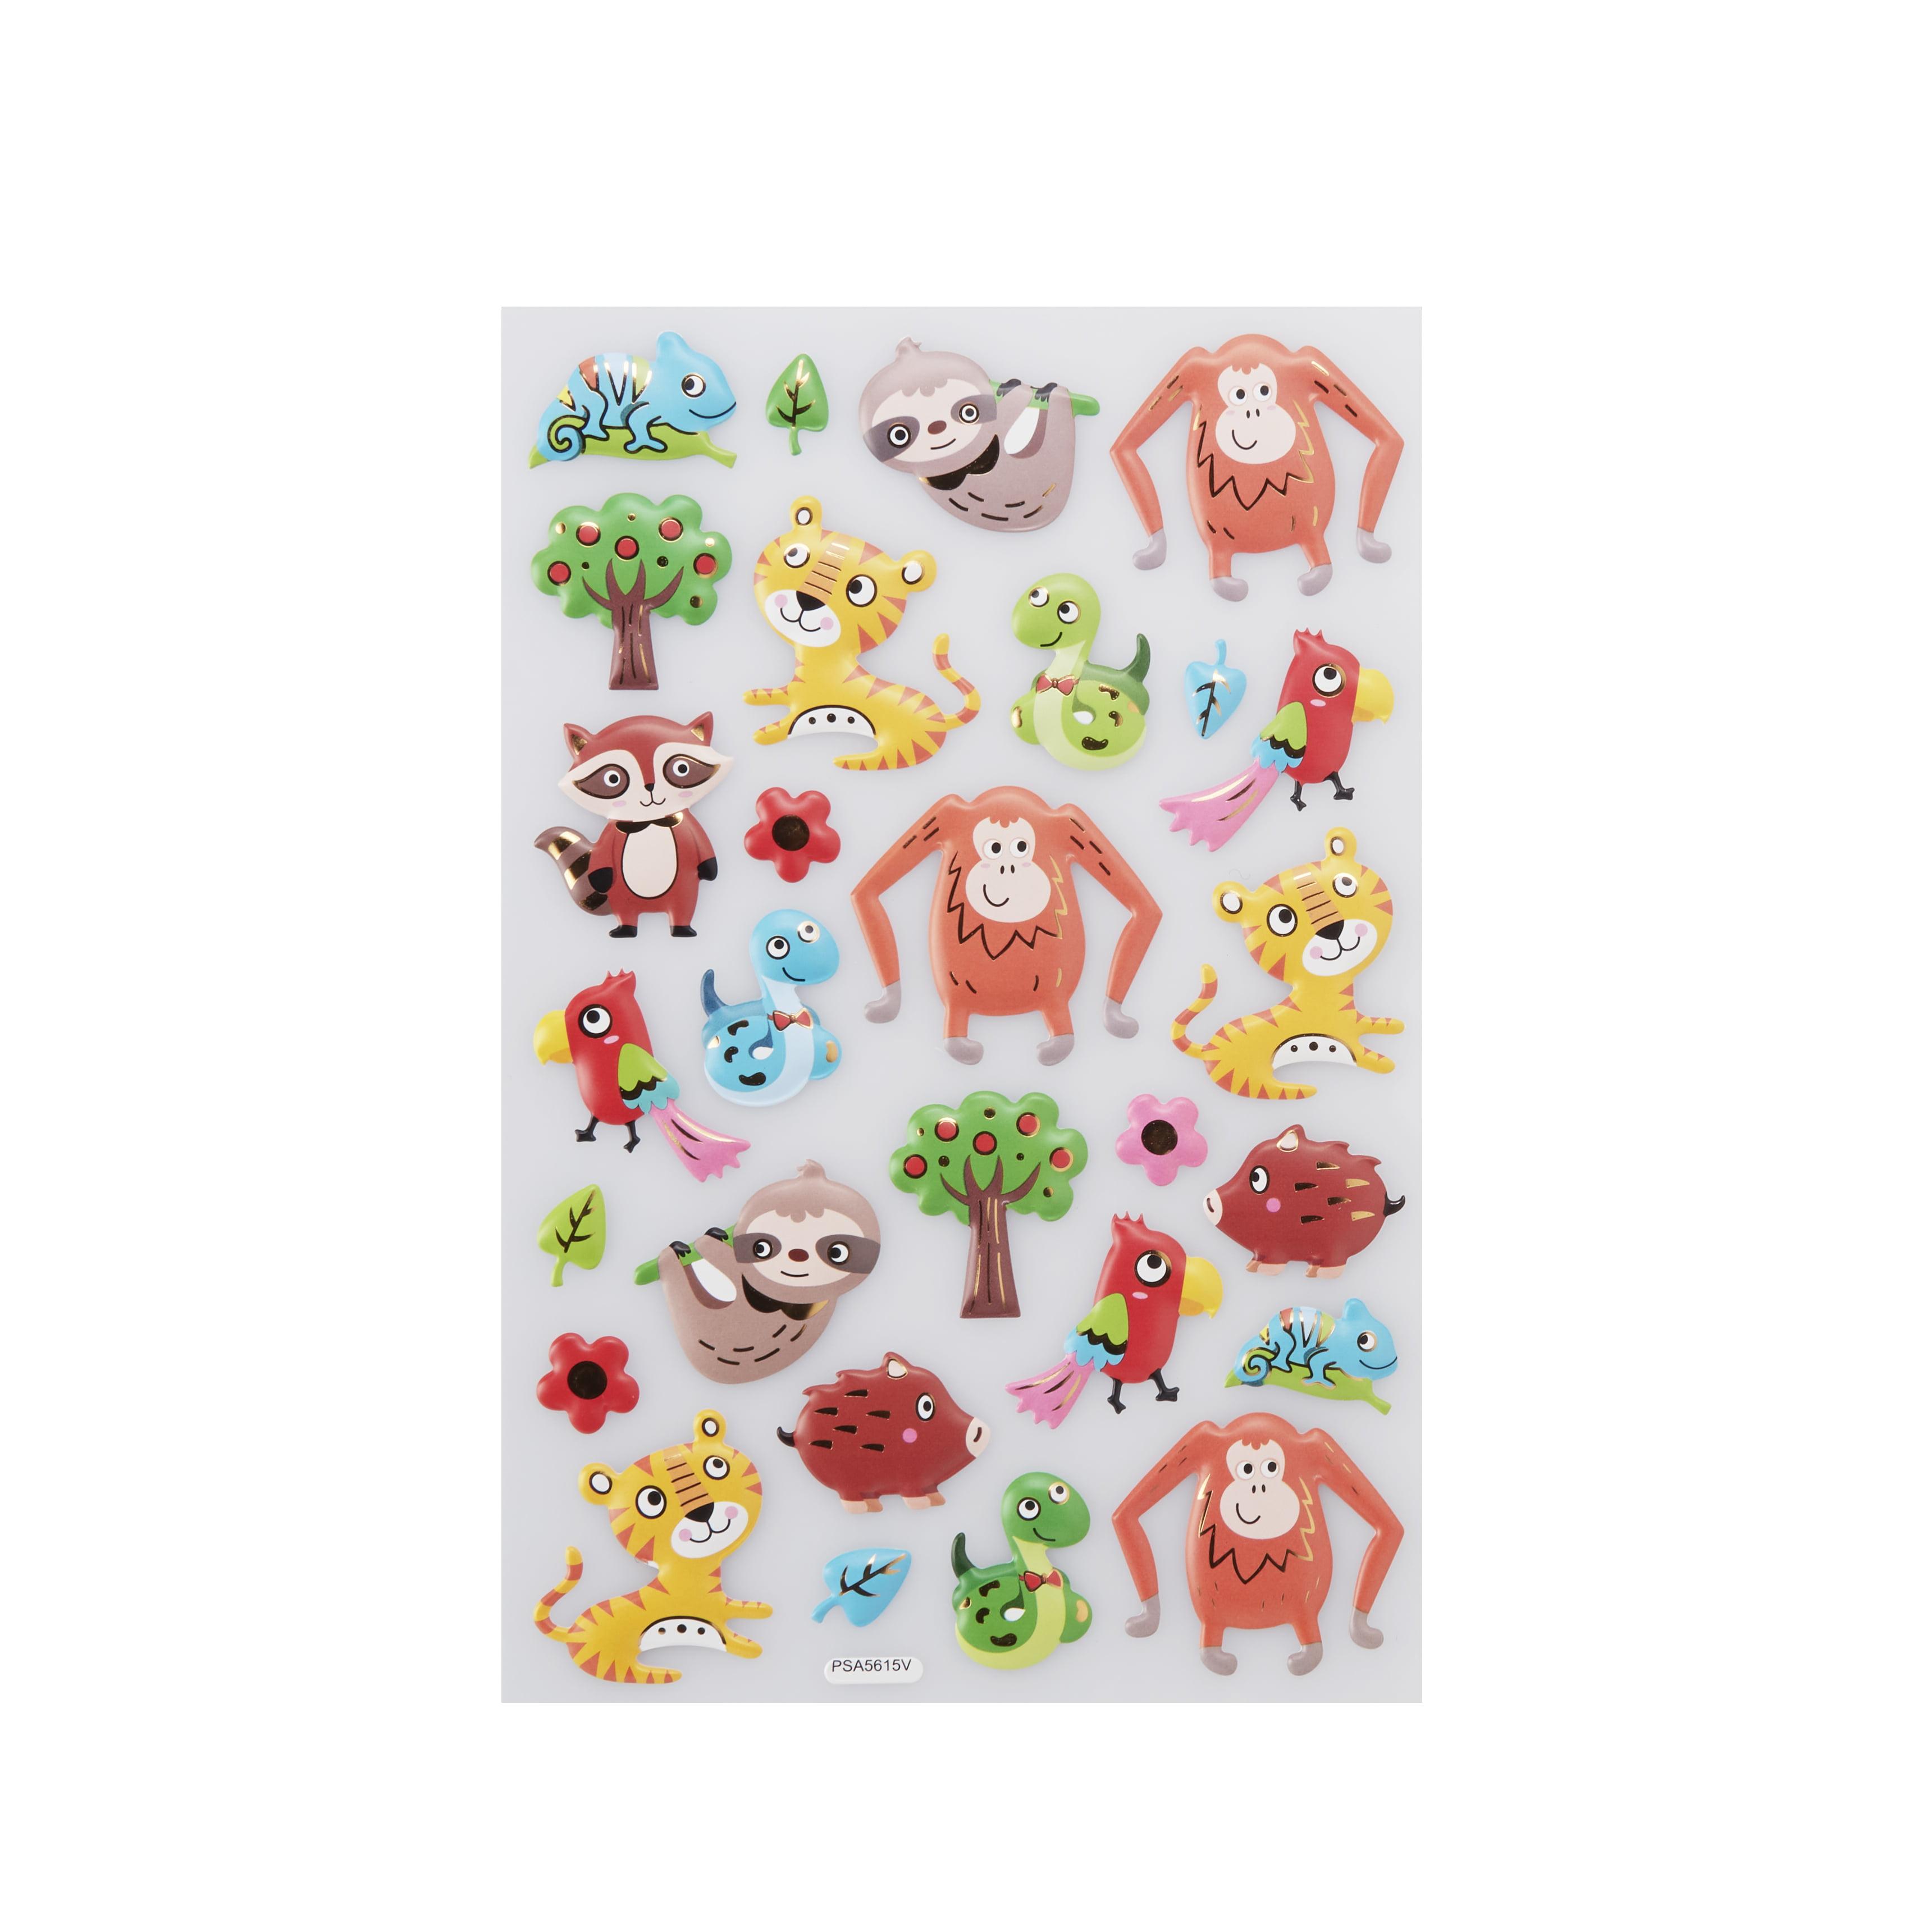 WayToCelebrate Easter 3-D Pop-Up Foil Stickers, Animals, 28 Count